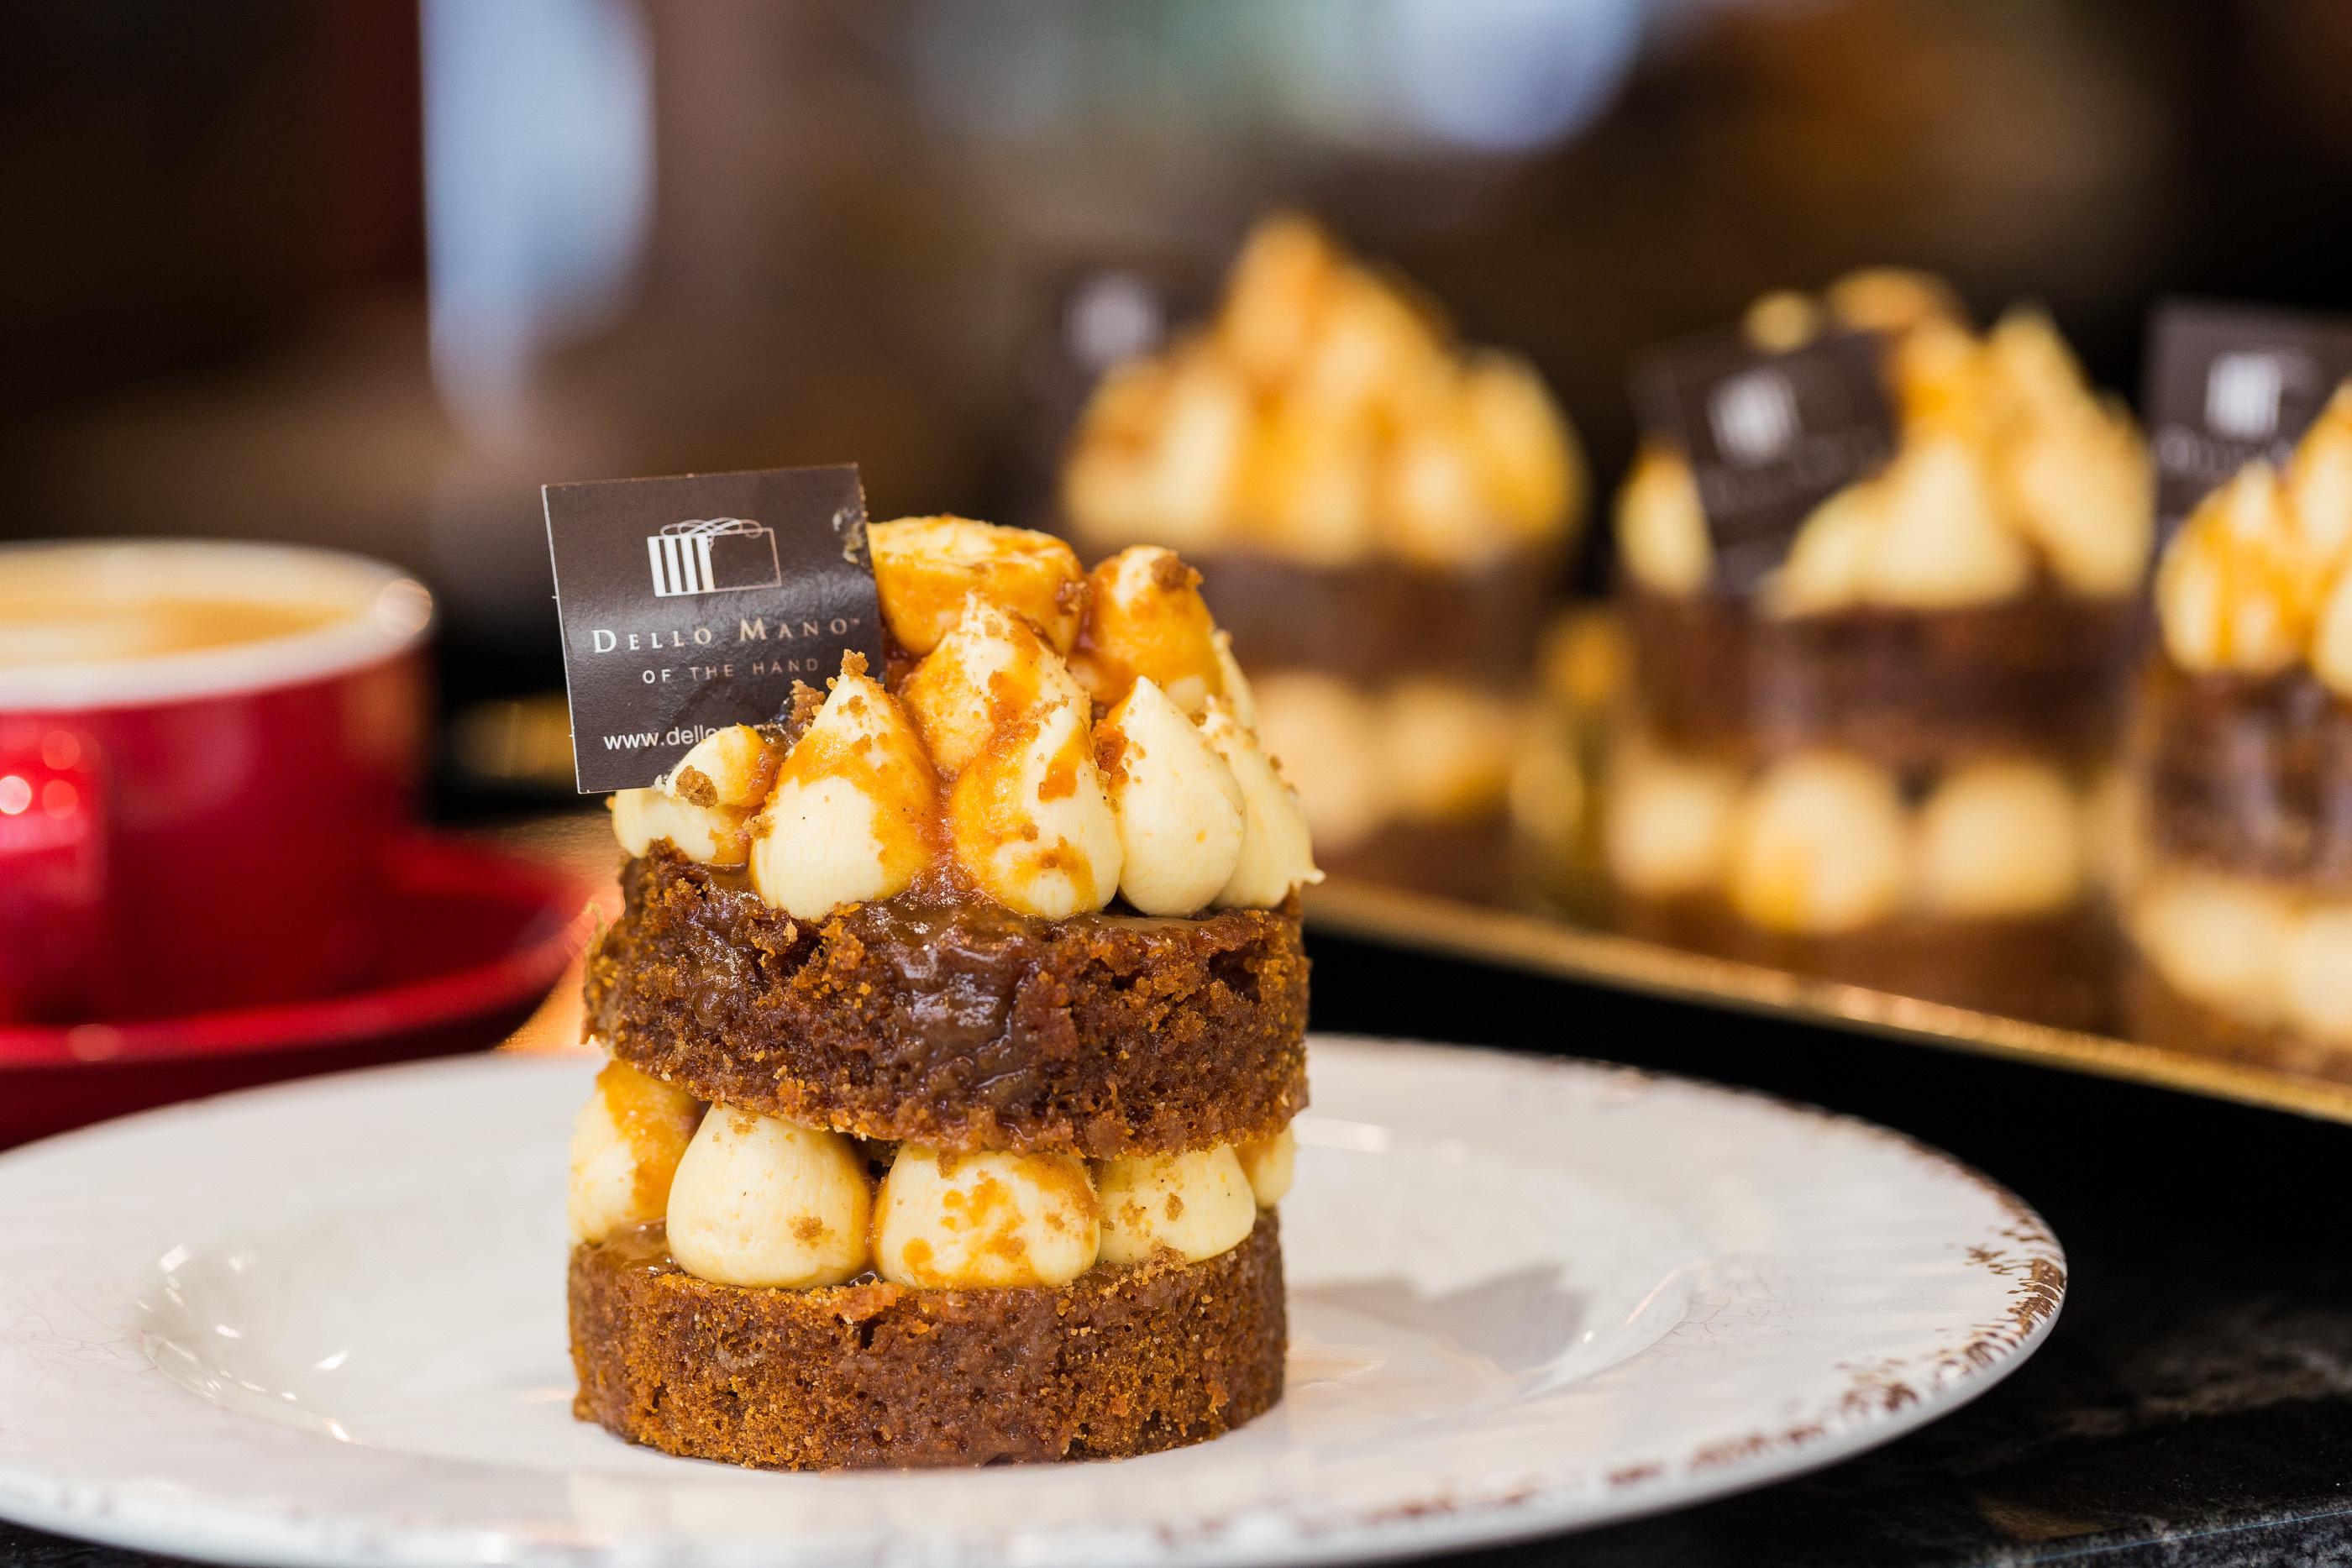 Golden Gaytime ode mudcake at Dello Mano